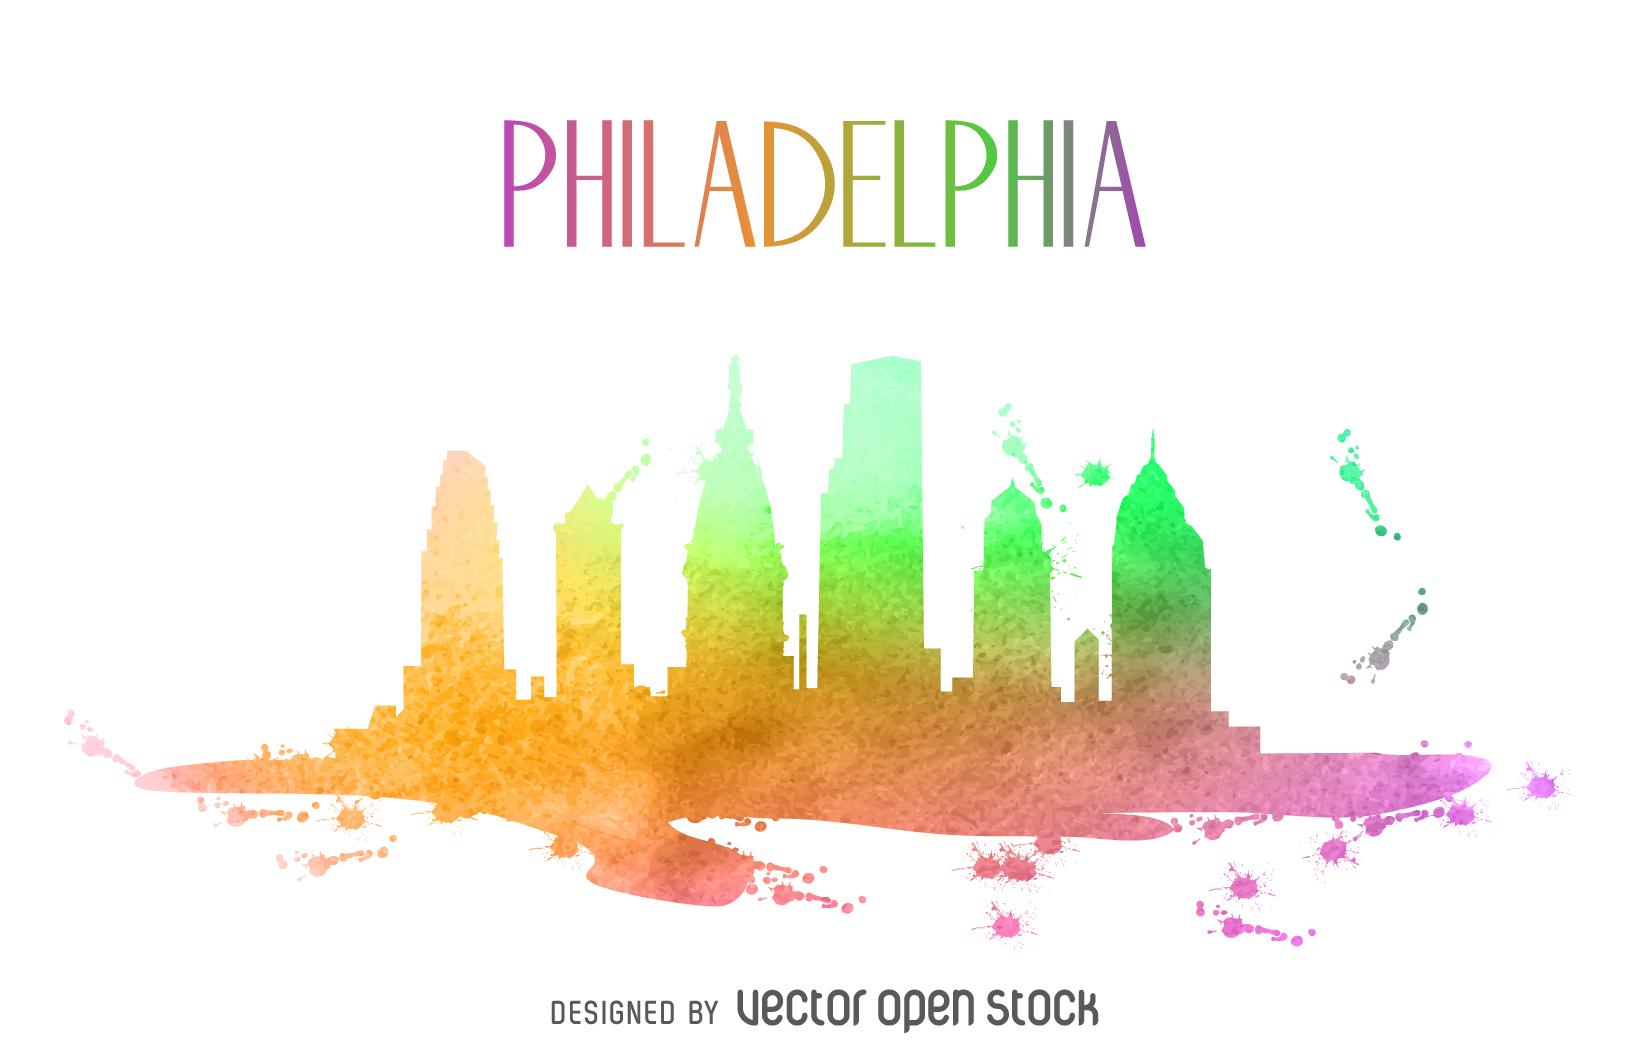 1650x1052 Philadelphia Watercolor Skyline Silhouette